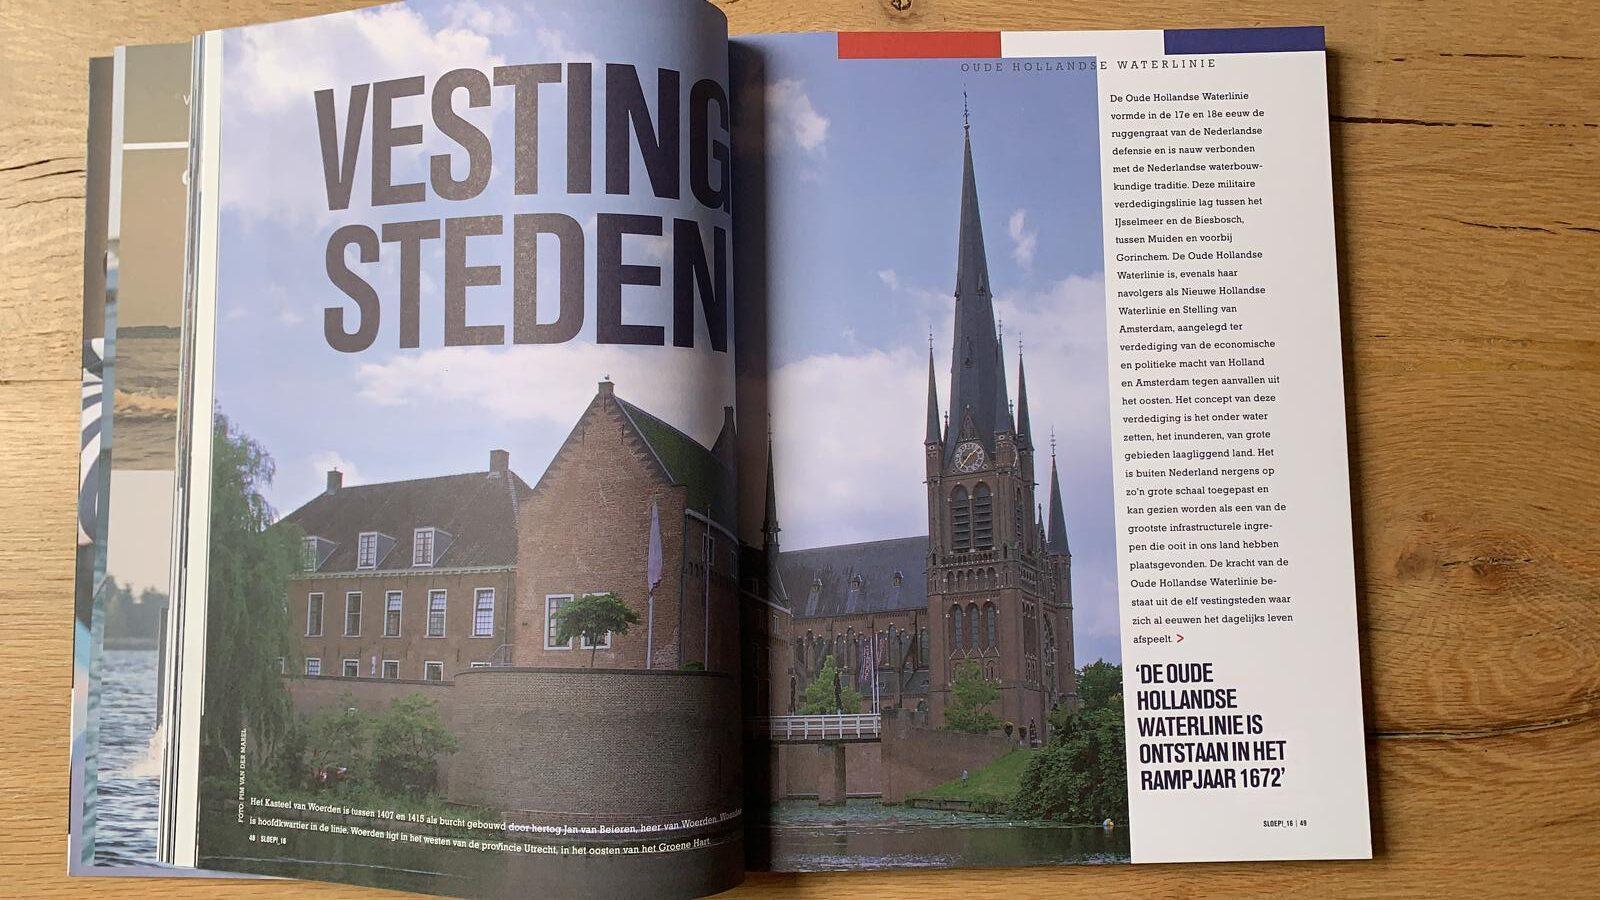 Oude Hollandse Waterlinie in het fraaie tijdschrift Sloep!